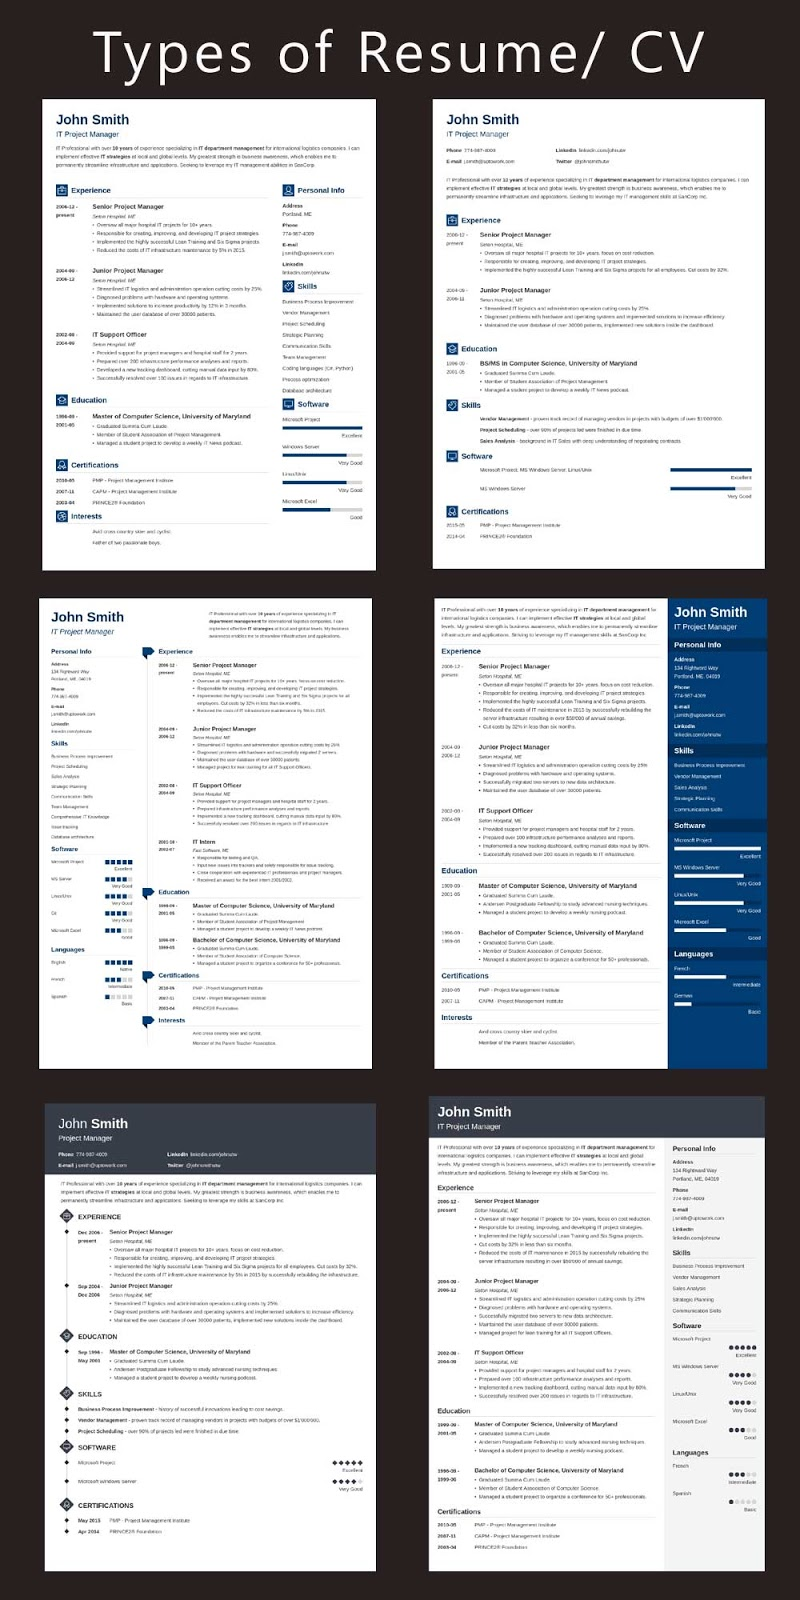 Types of Resume/ CV